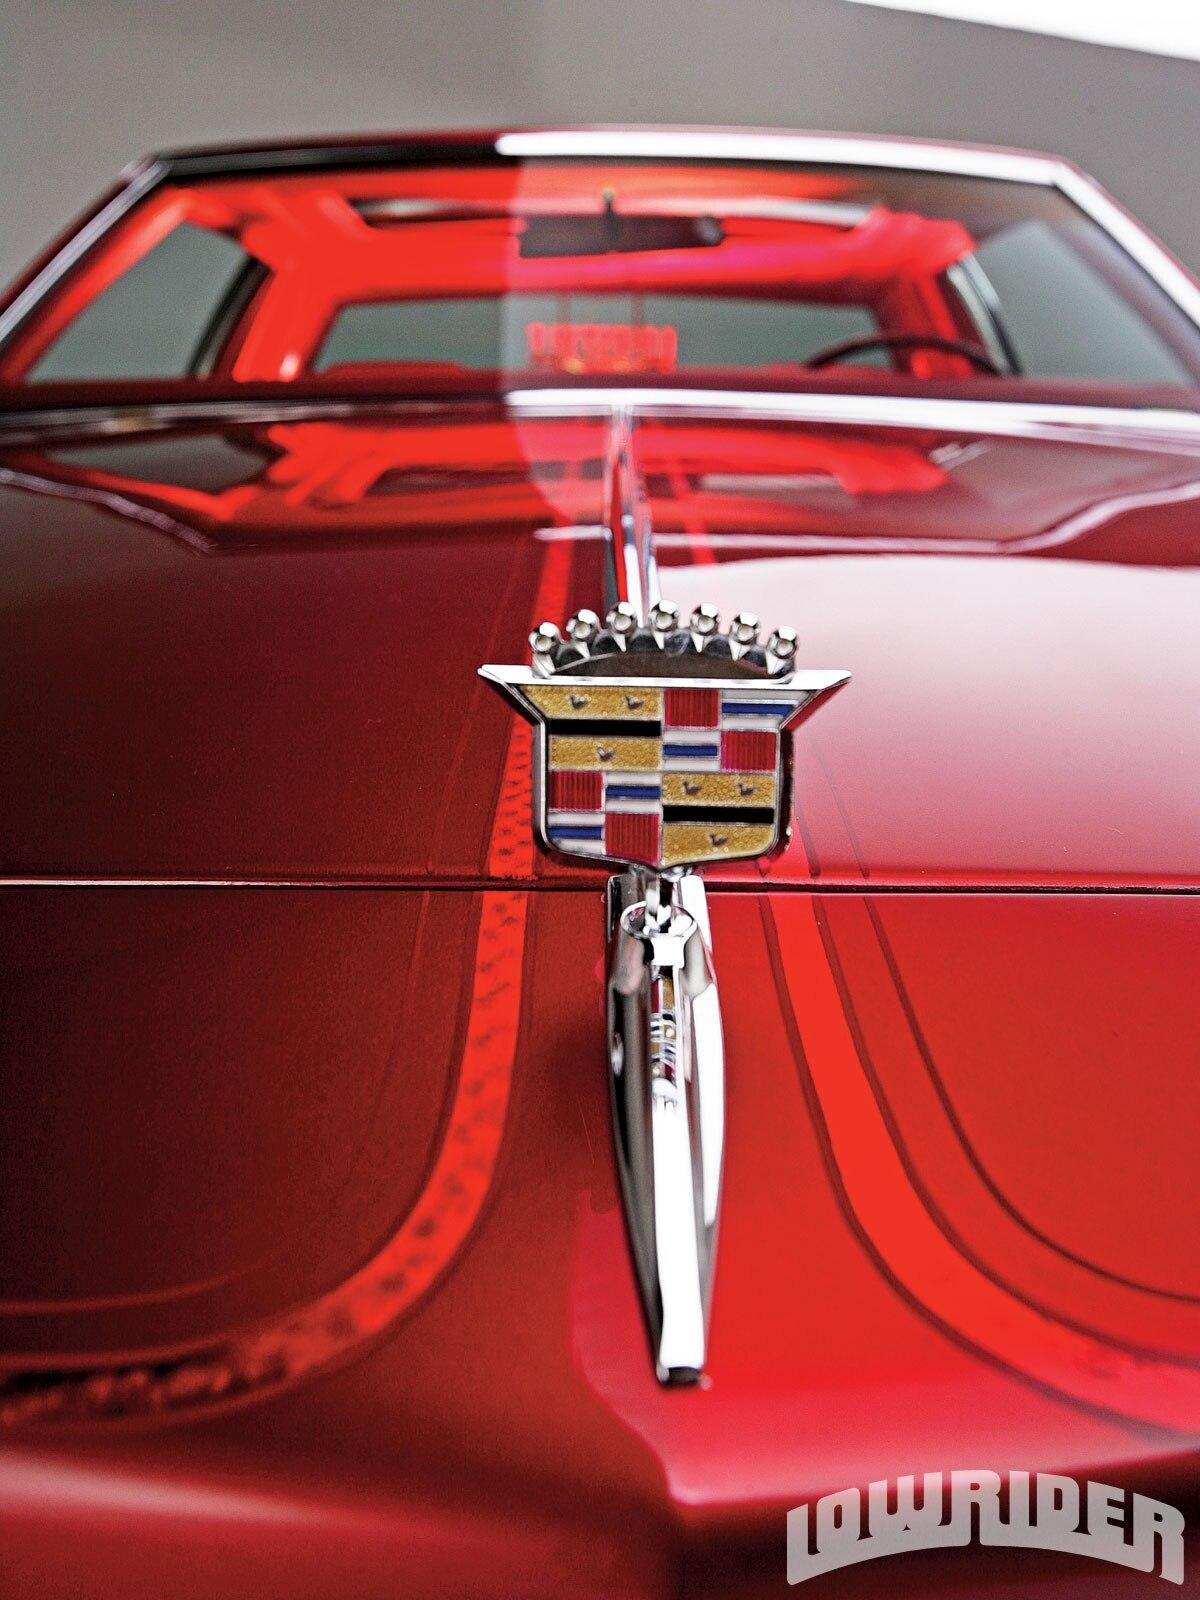 1001-lrmp-04-o-1984-cadillac-coupe-deville-hood-ornament3